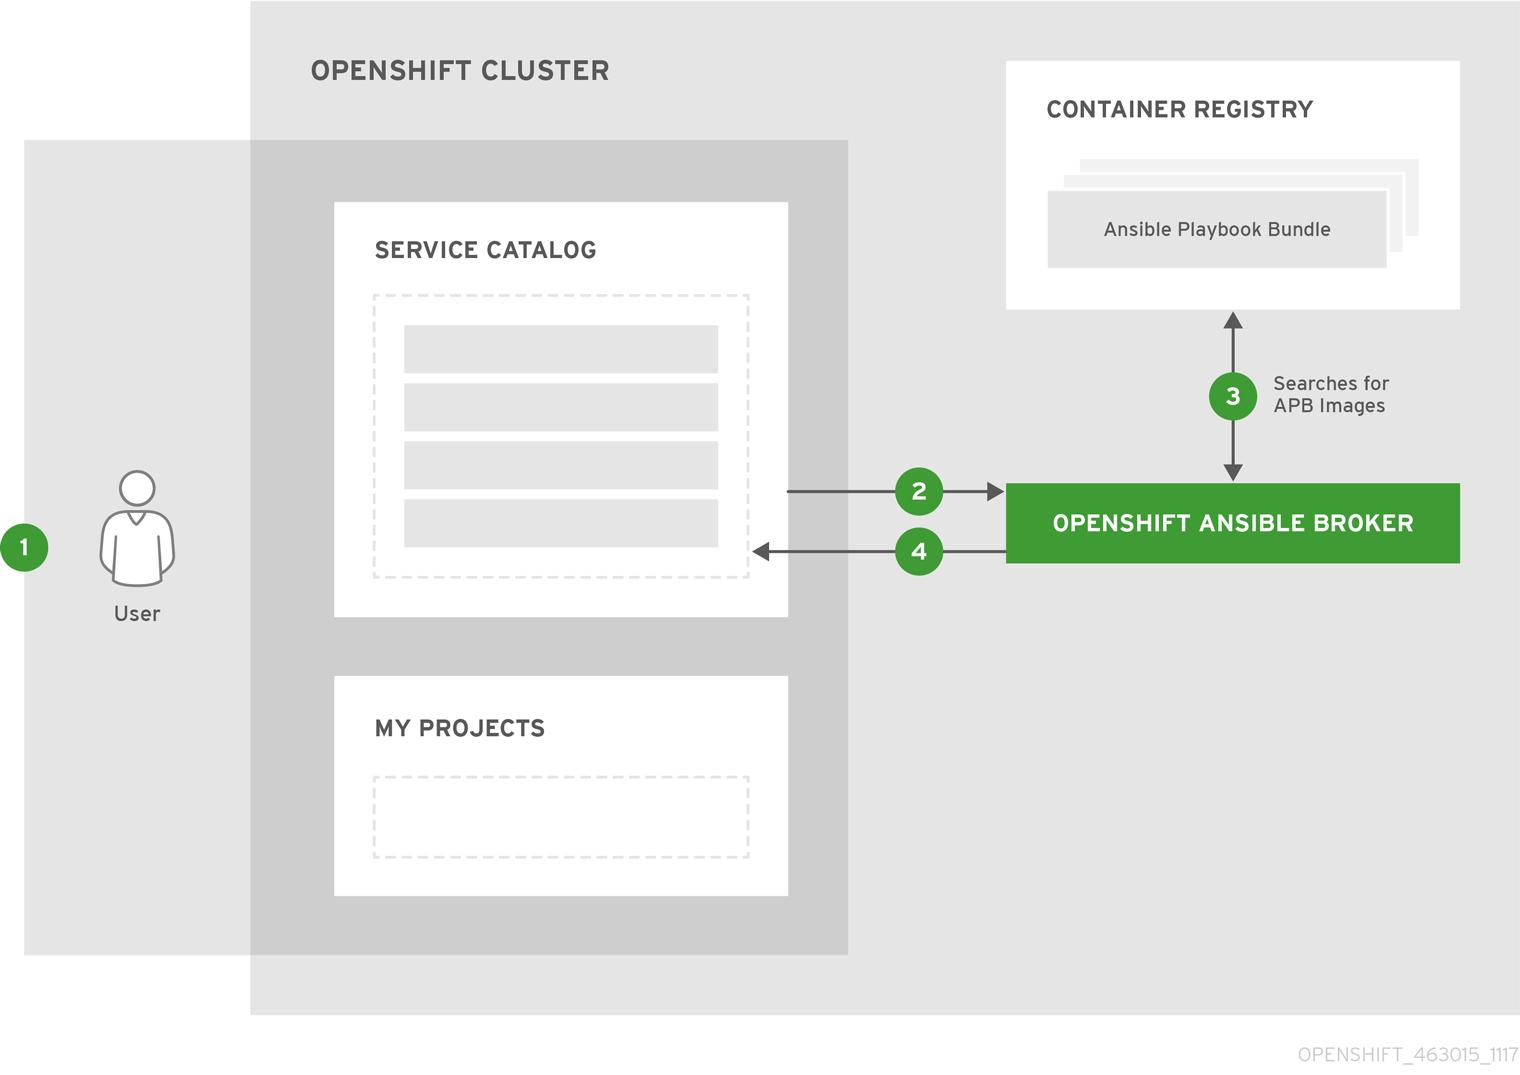 OpenShift ContainerPlatform APB DevelopmentGuide 463015 1117 Deploy p1